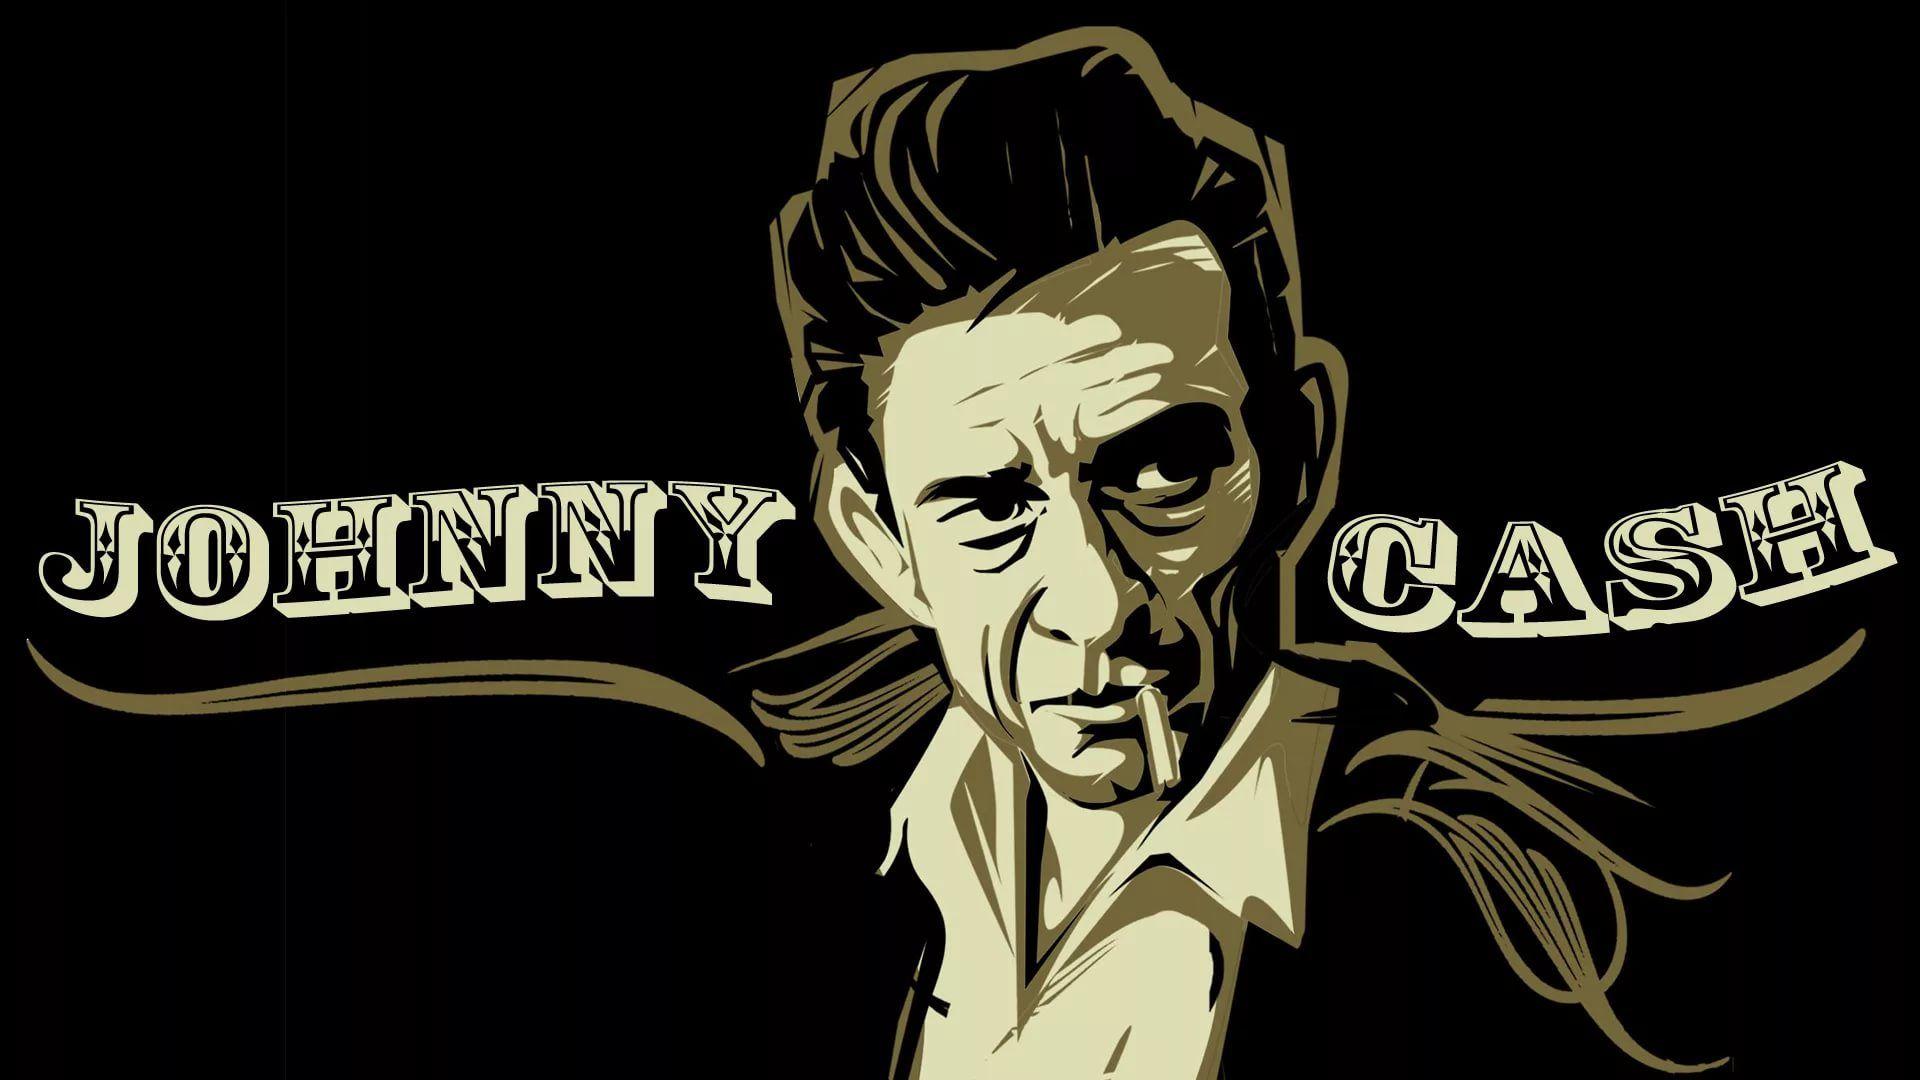 Johnny Cash hd desktop wallpaper